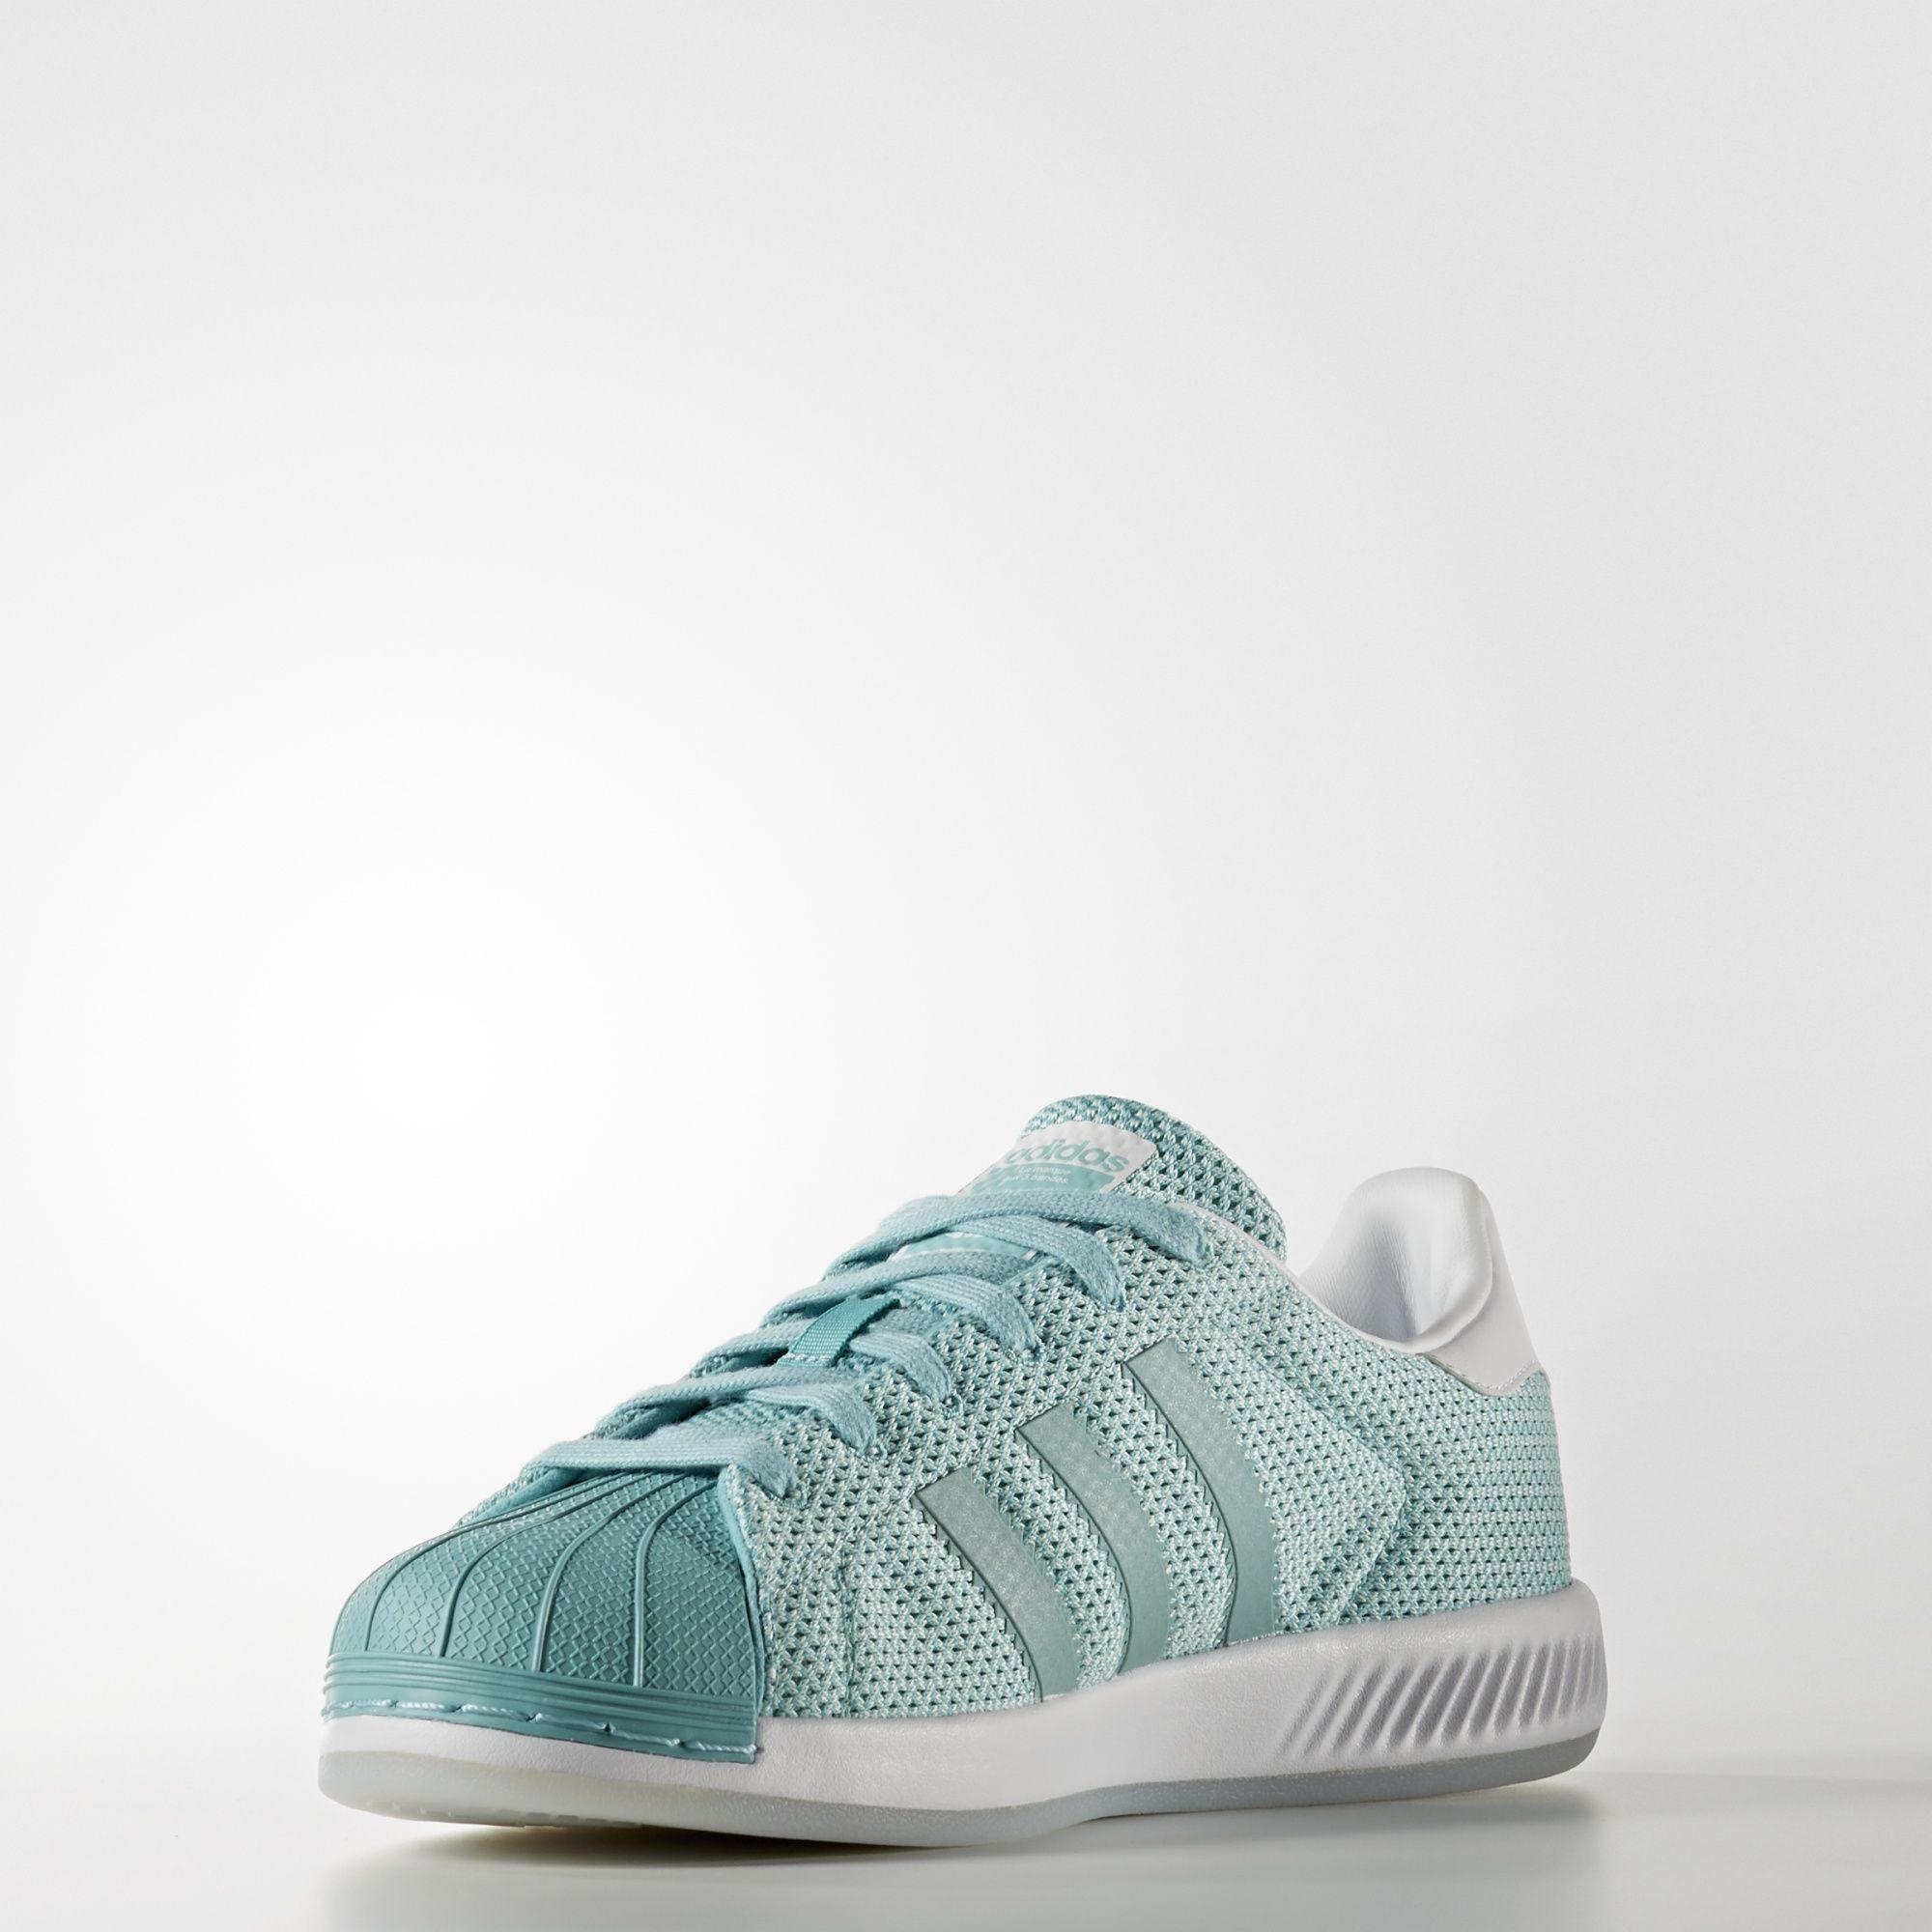 adidas - Chaussure Superstar Bounce · Adidas SuperstarBbFatherShoePaiDads